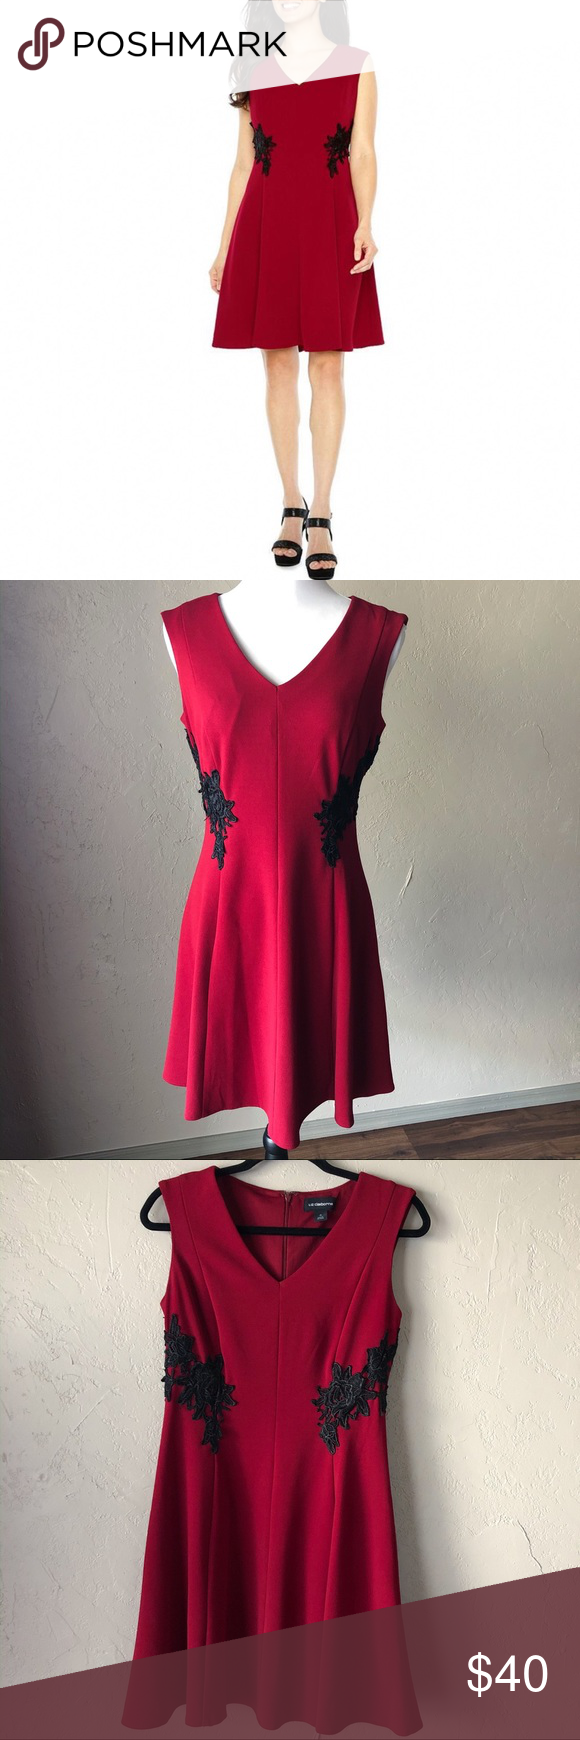 Liz Claiborne Sleeveless Red Dress Red Dress Dresses Colorful Dresses